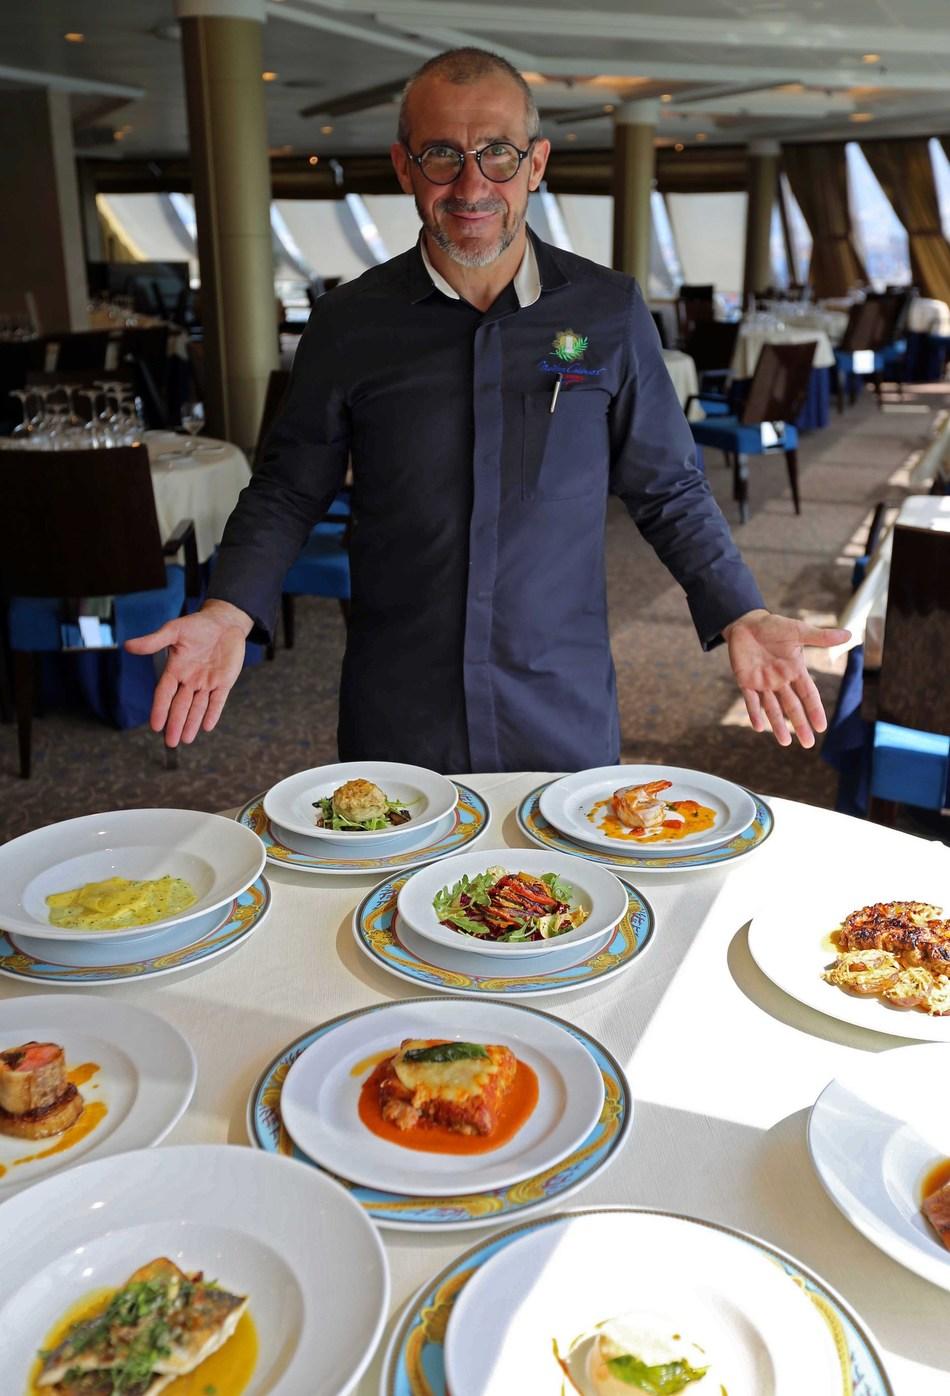 Chef Franck Garanger with Toscana Dishes